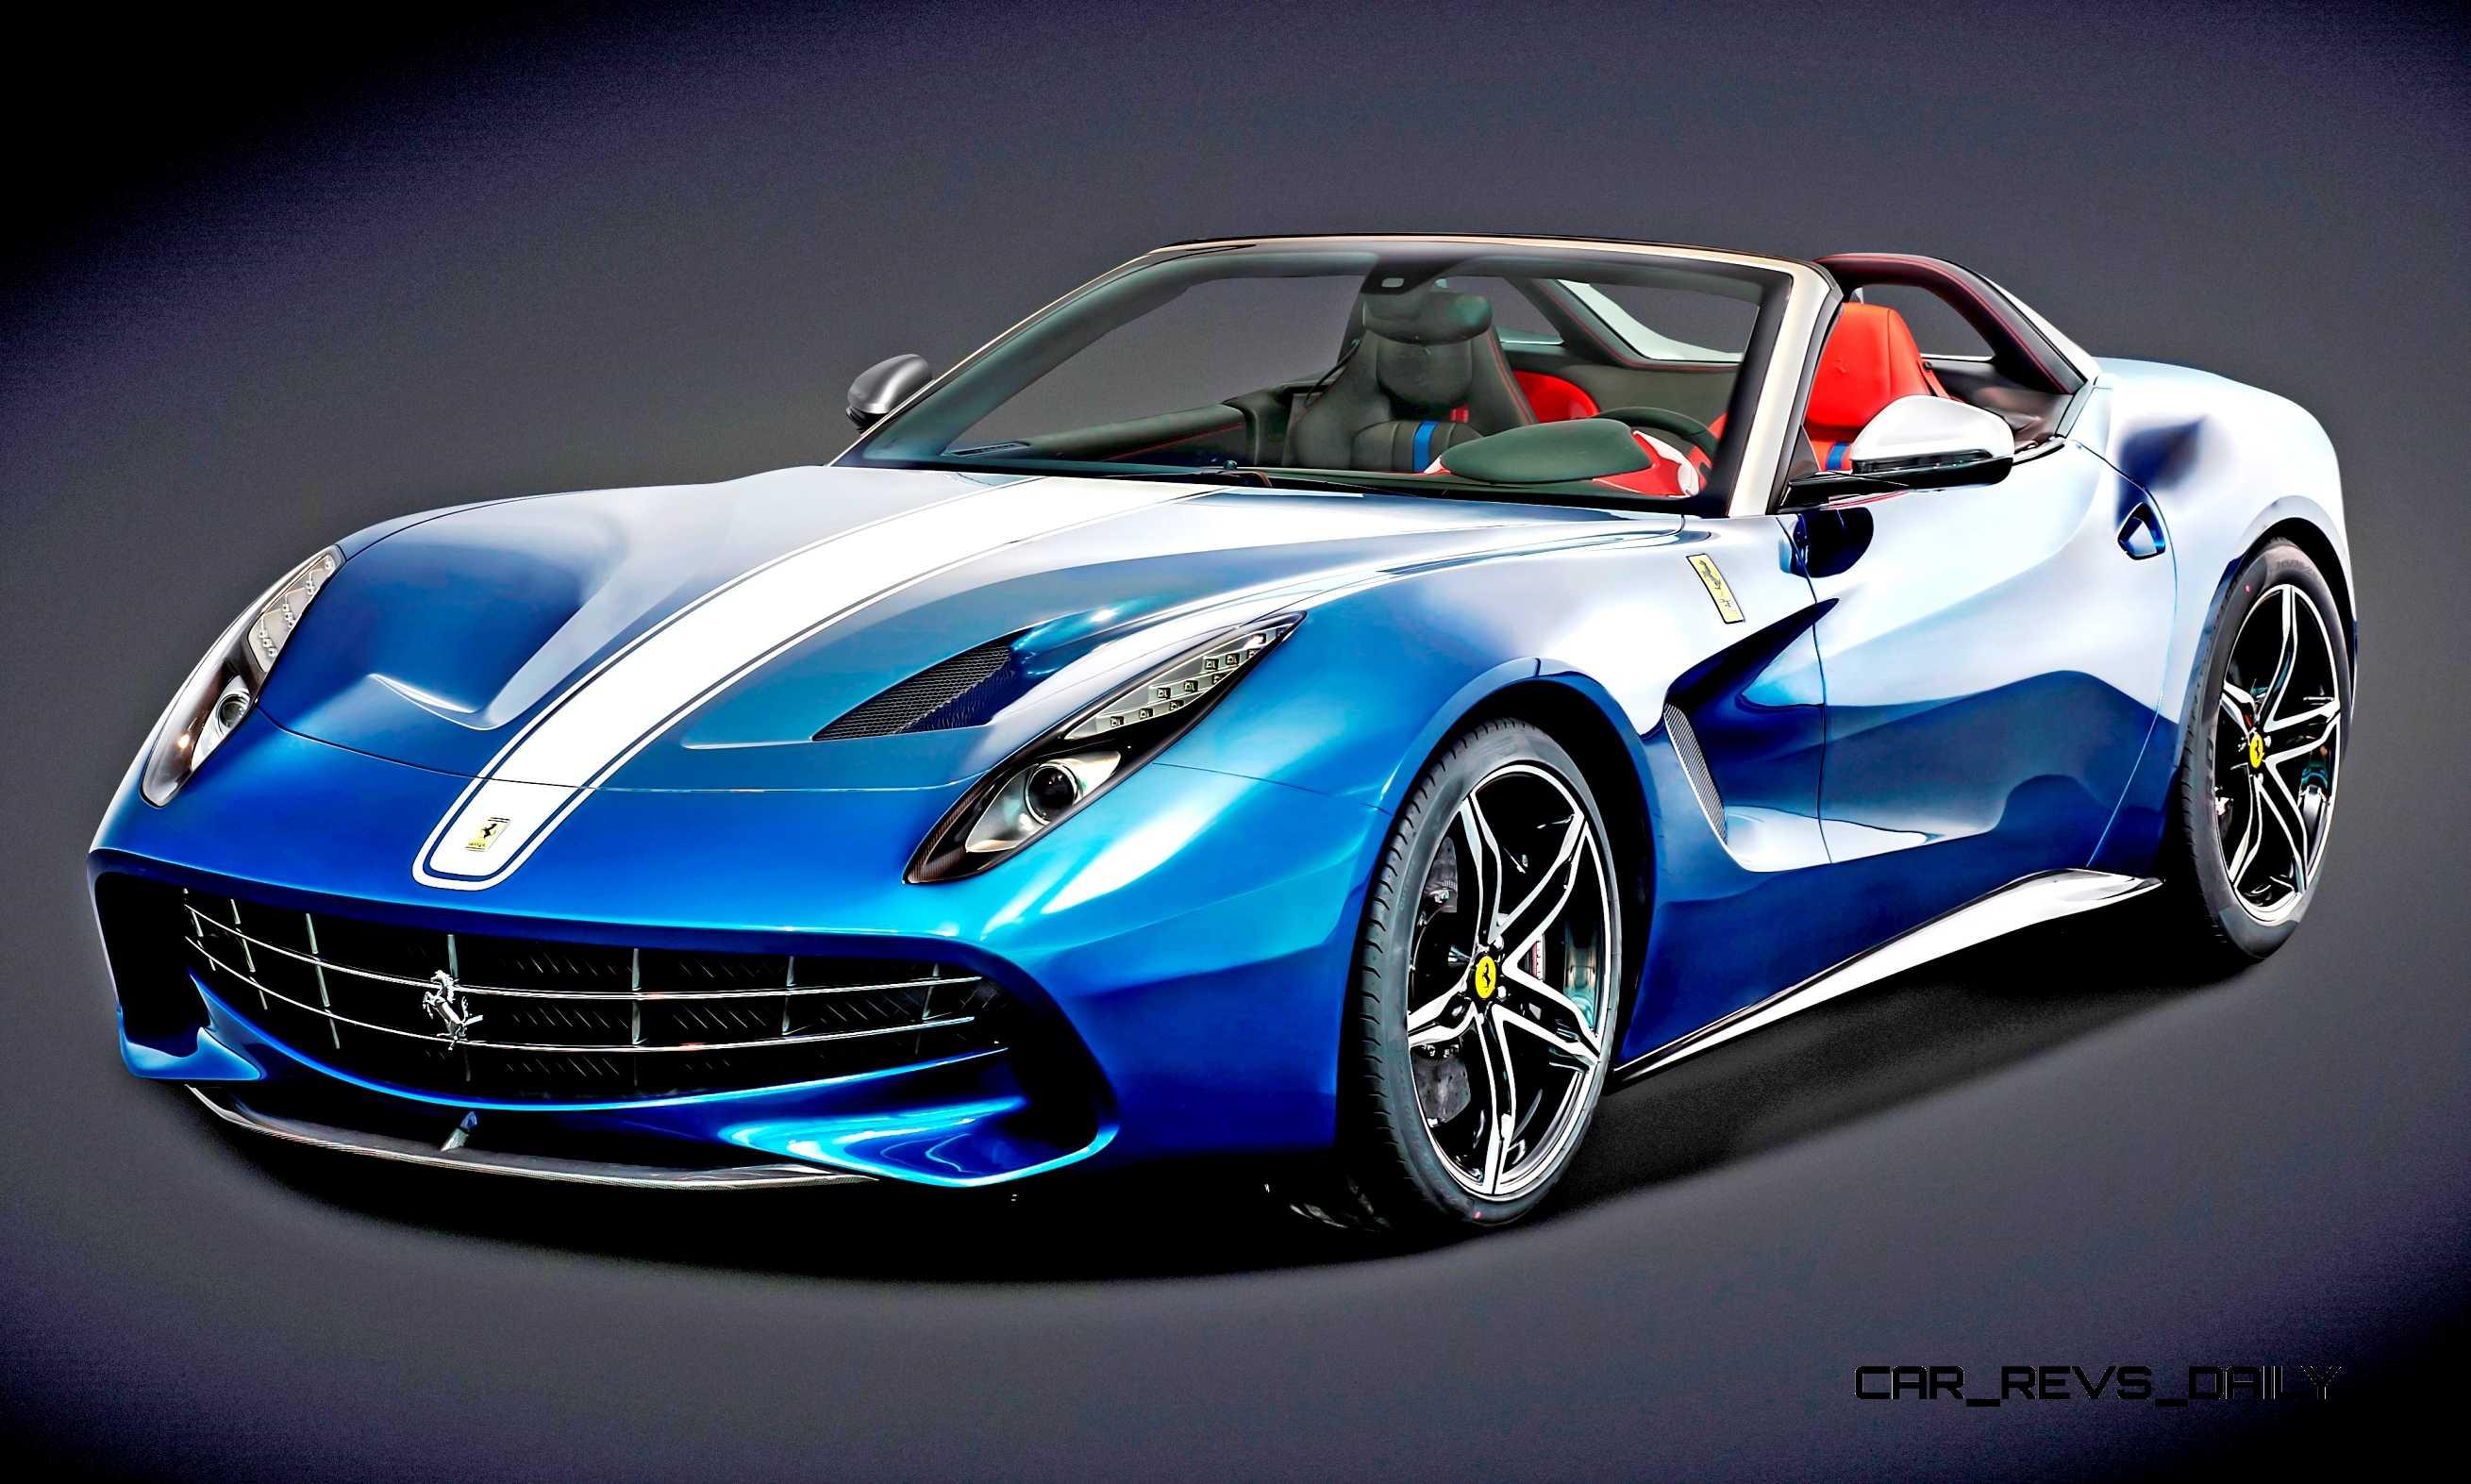 Ferrari Beverly Hills >> 3.1s 2015 Ferrari F60 America Is 10-Copy F12 Spyder Celebrating 60 Years of Ferrari in USA